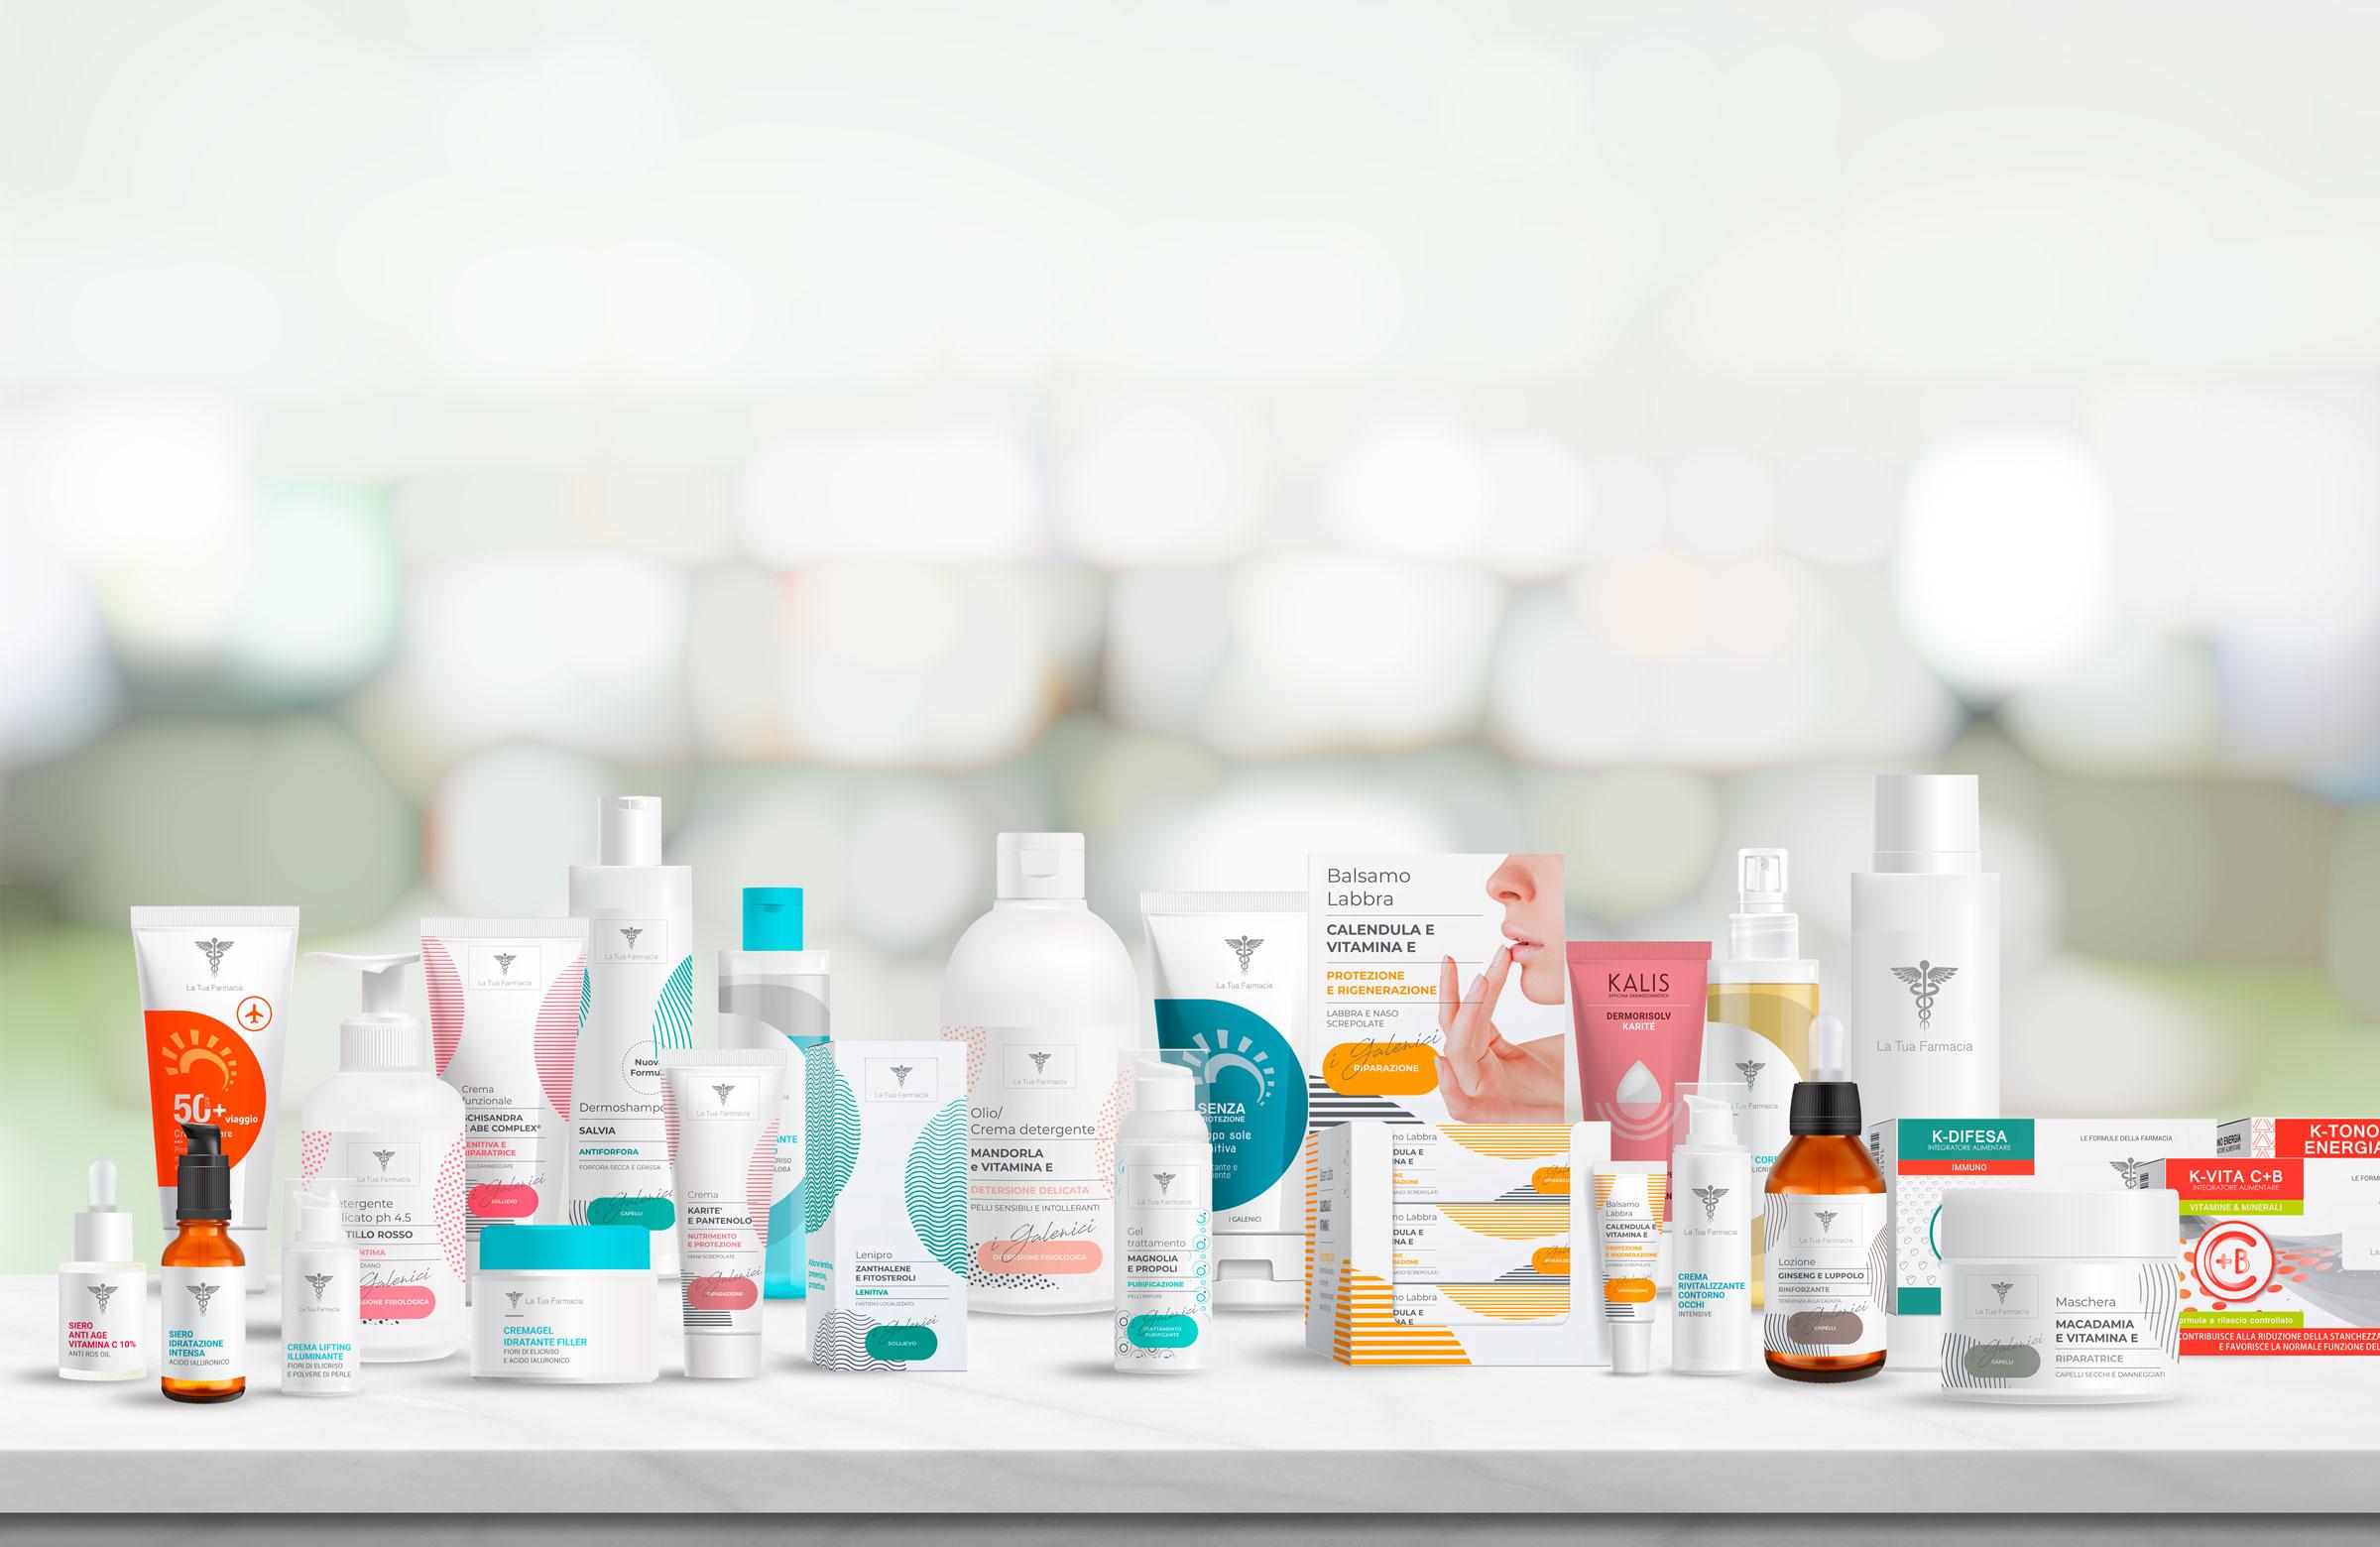 Integratori-e-cosmetici-Kalis-v2